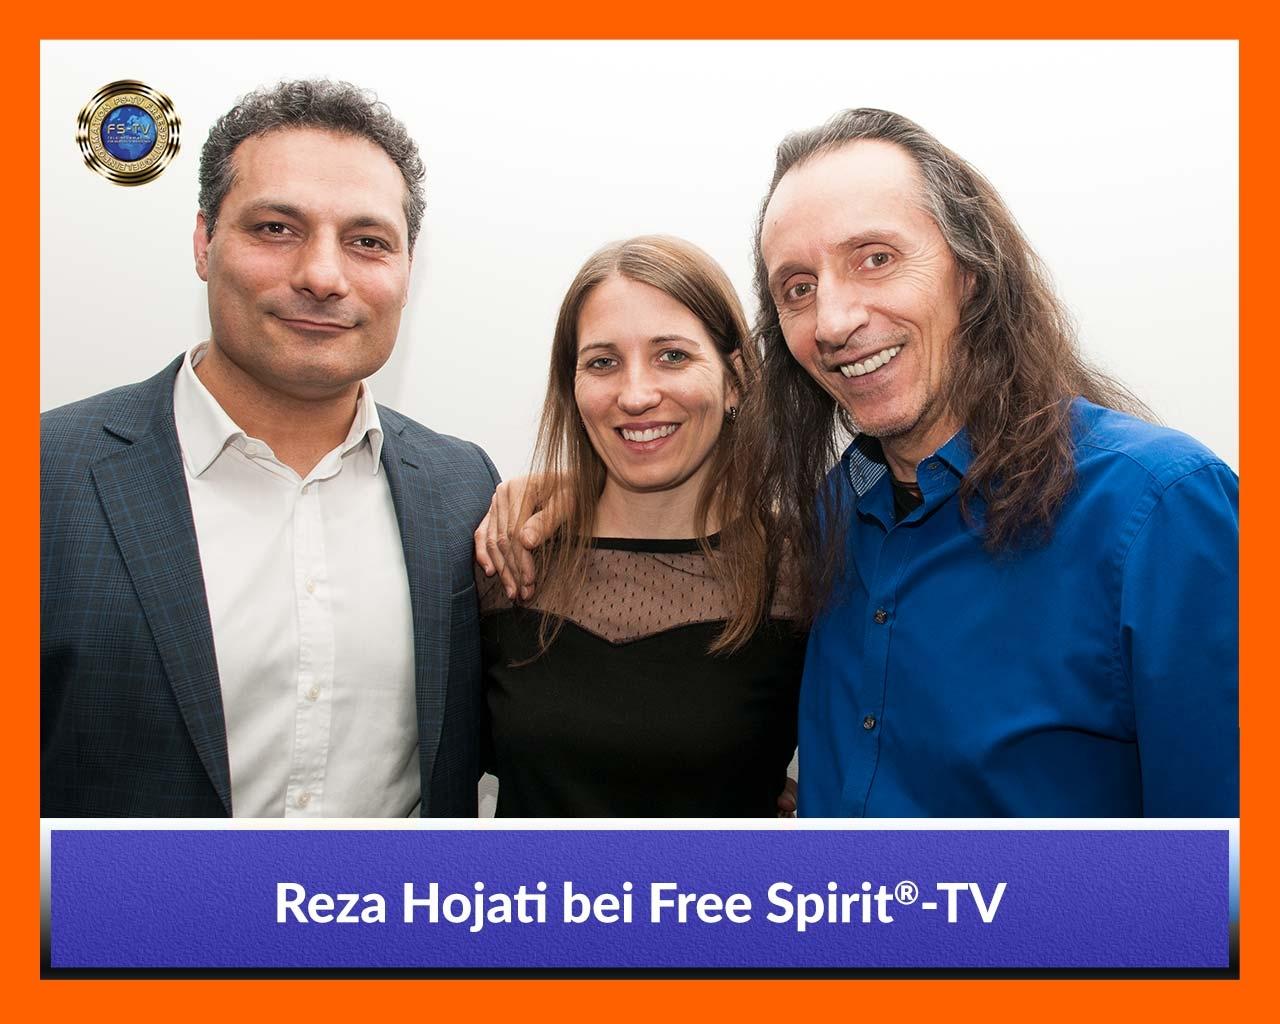 Reza-Hojati-03